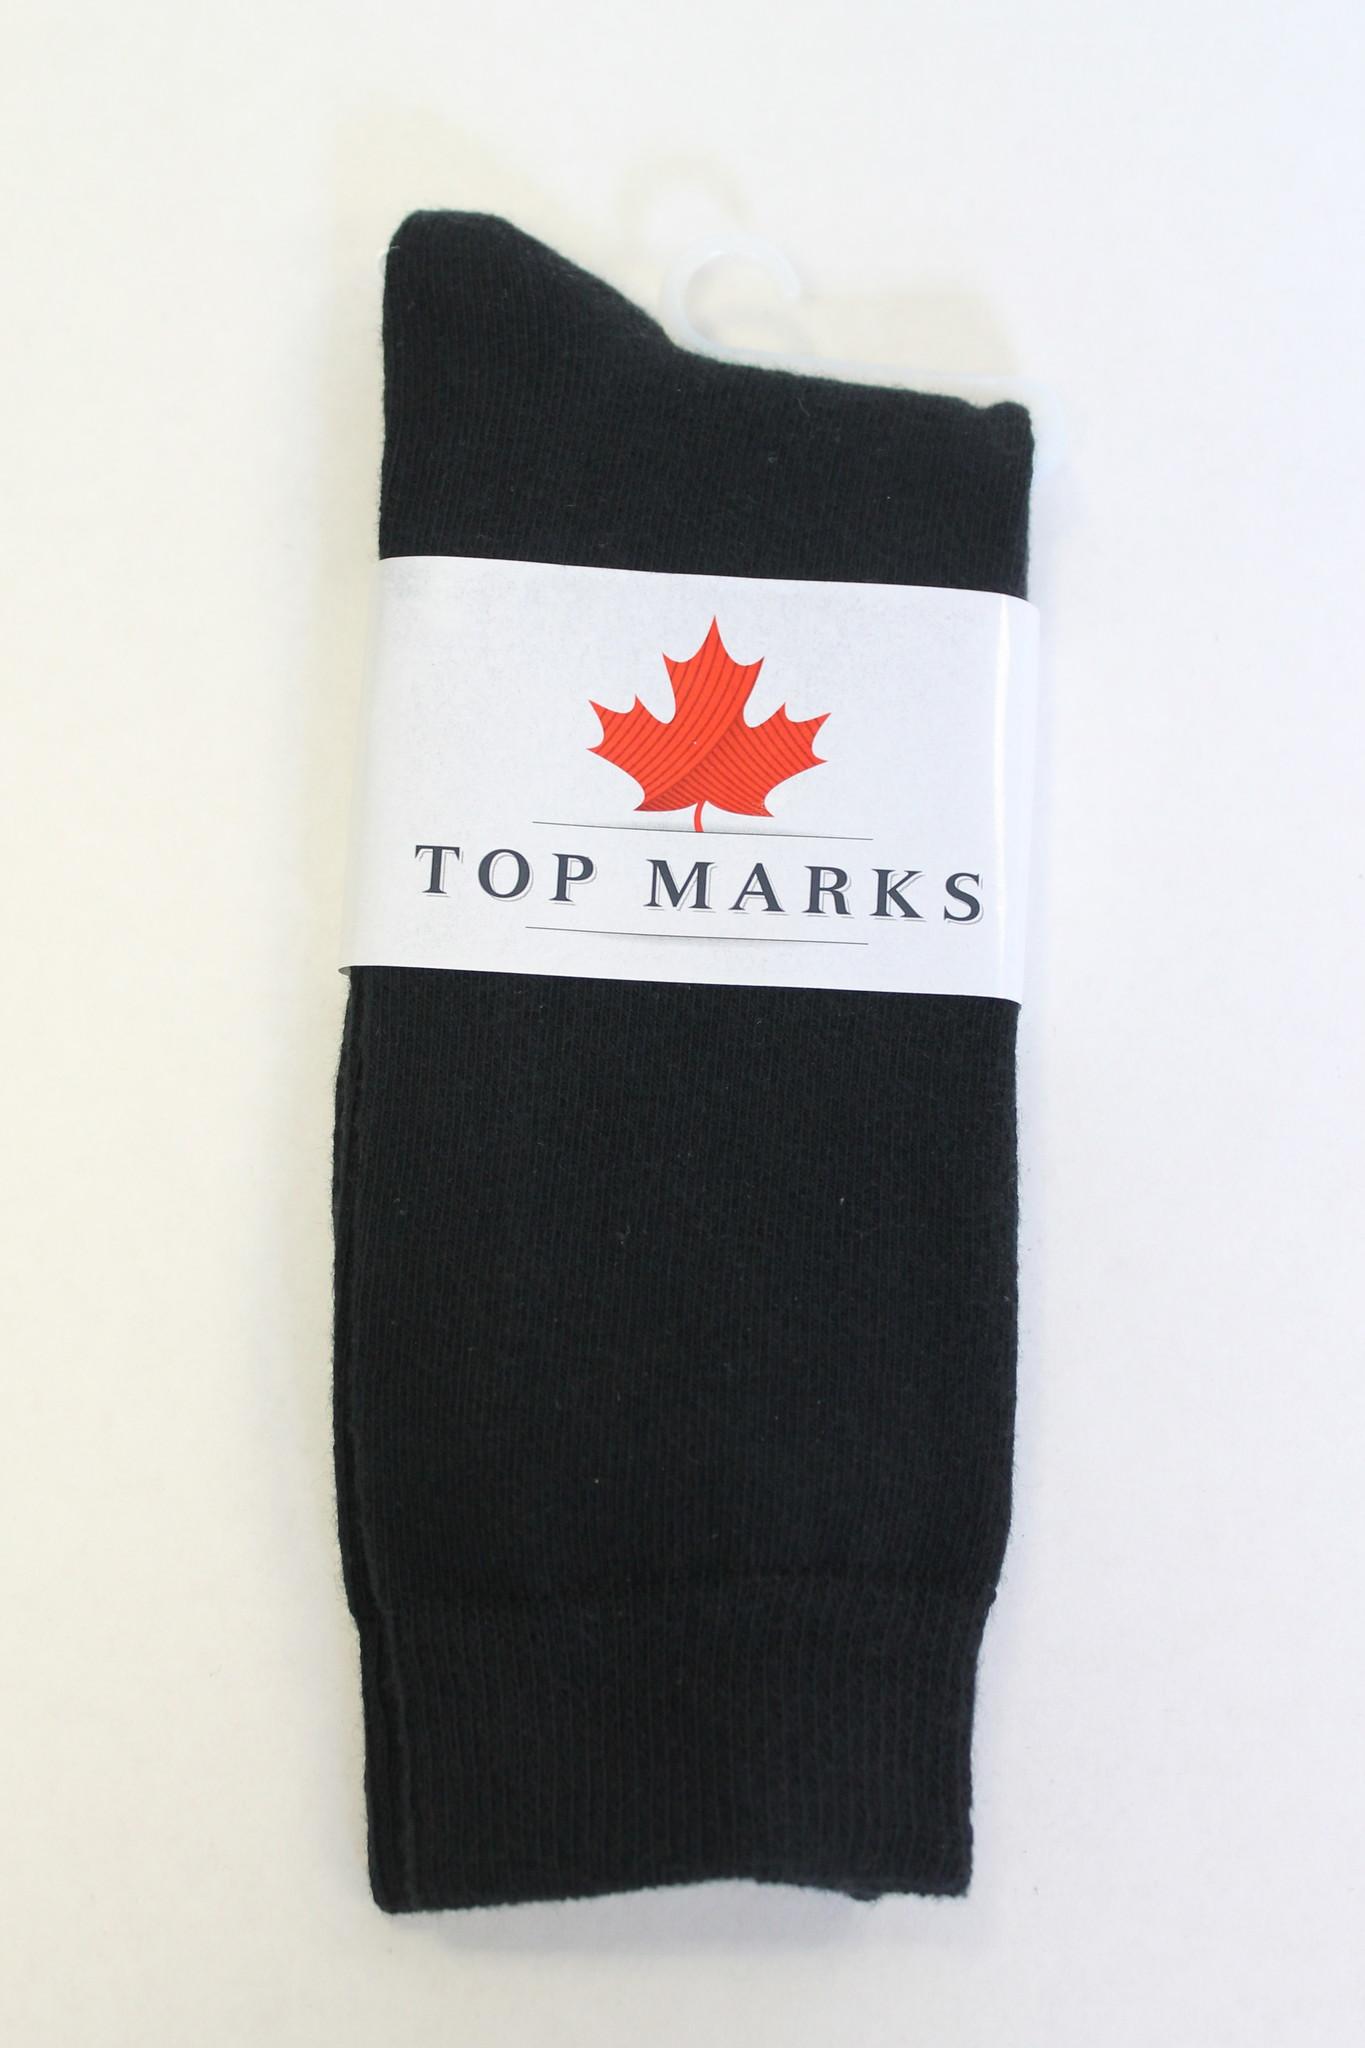 Classroom Dress - Black Socks (Men's)